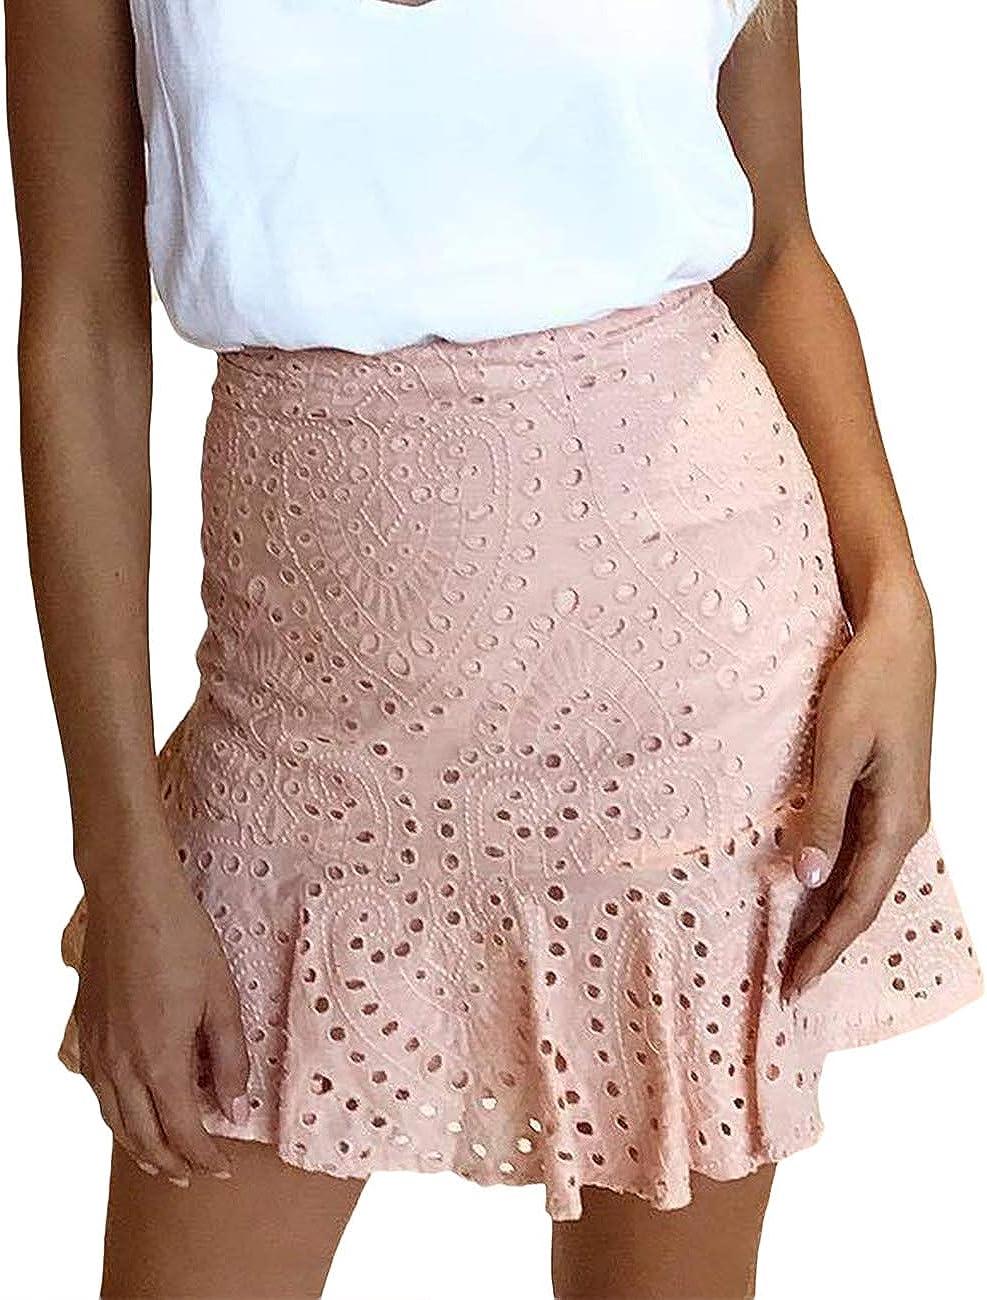 SEMATOMALA Womens Wear to Work Lace Mermaid Fishtail Ruffle Hem Pink Back Zip Up Bodycon Pencil Mini Skirt